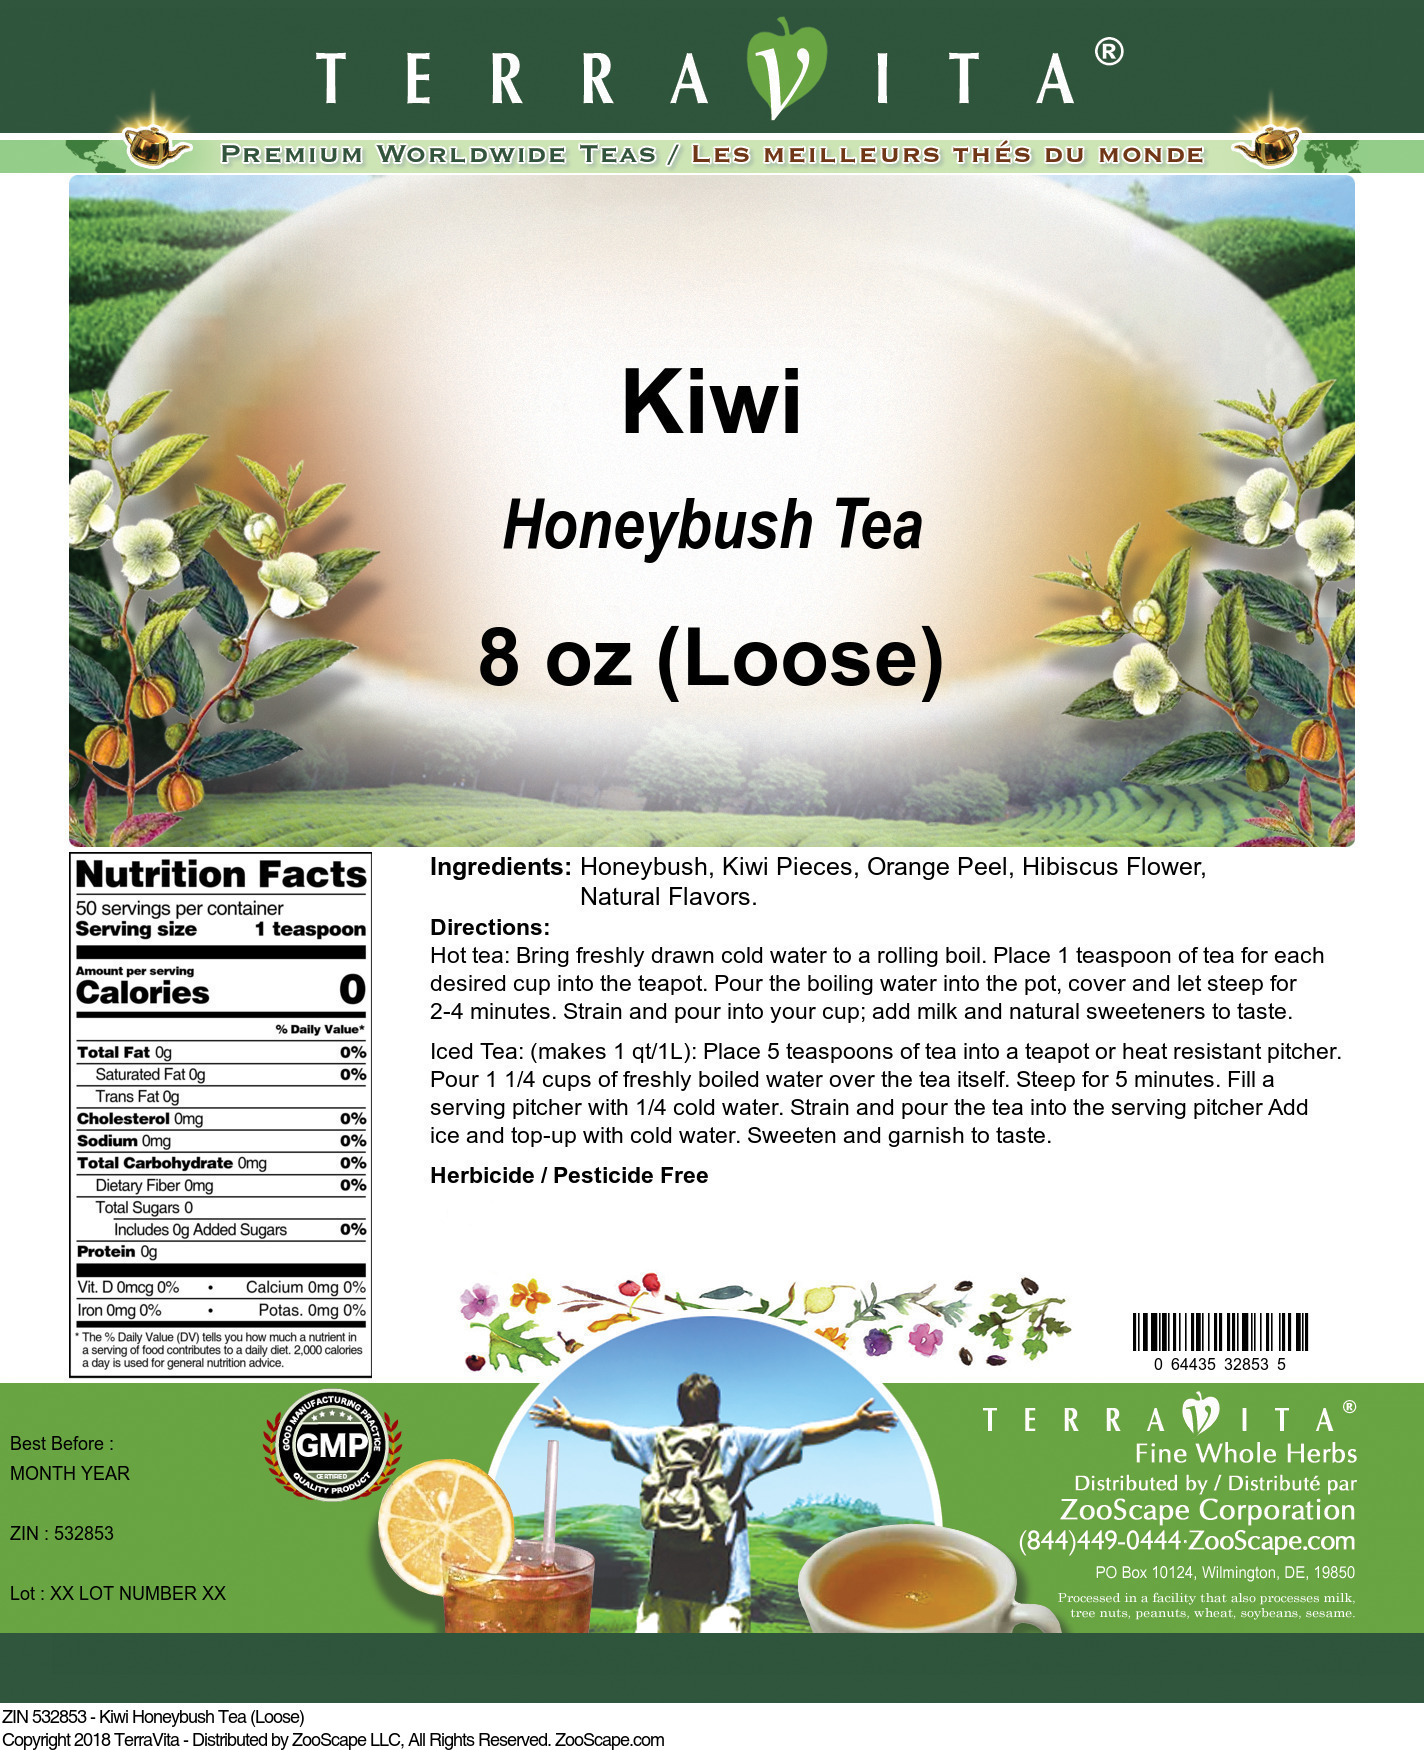 Kiwi Honeybush Tea (Loose)